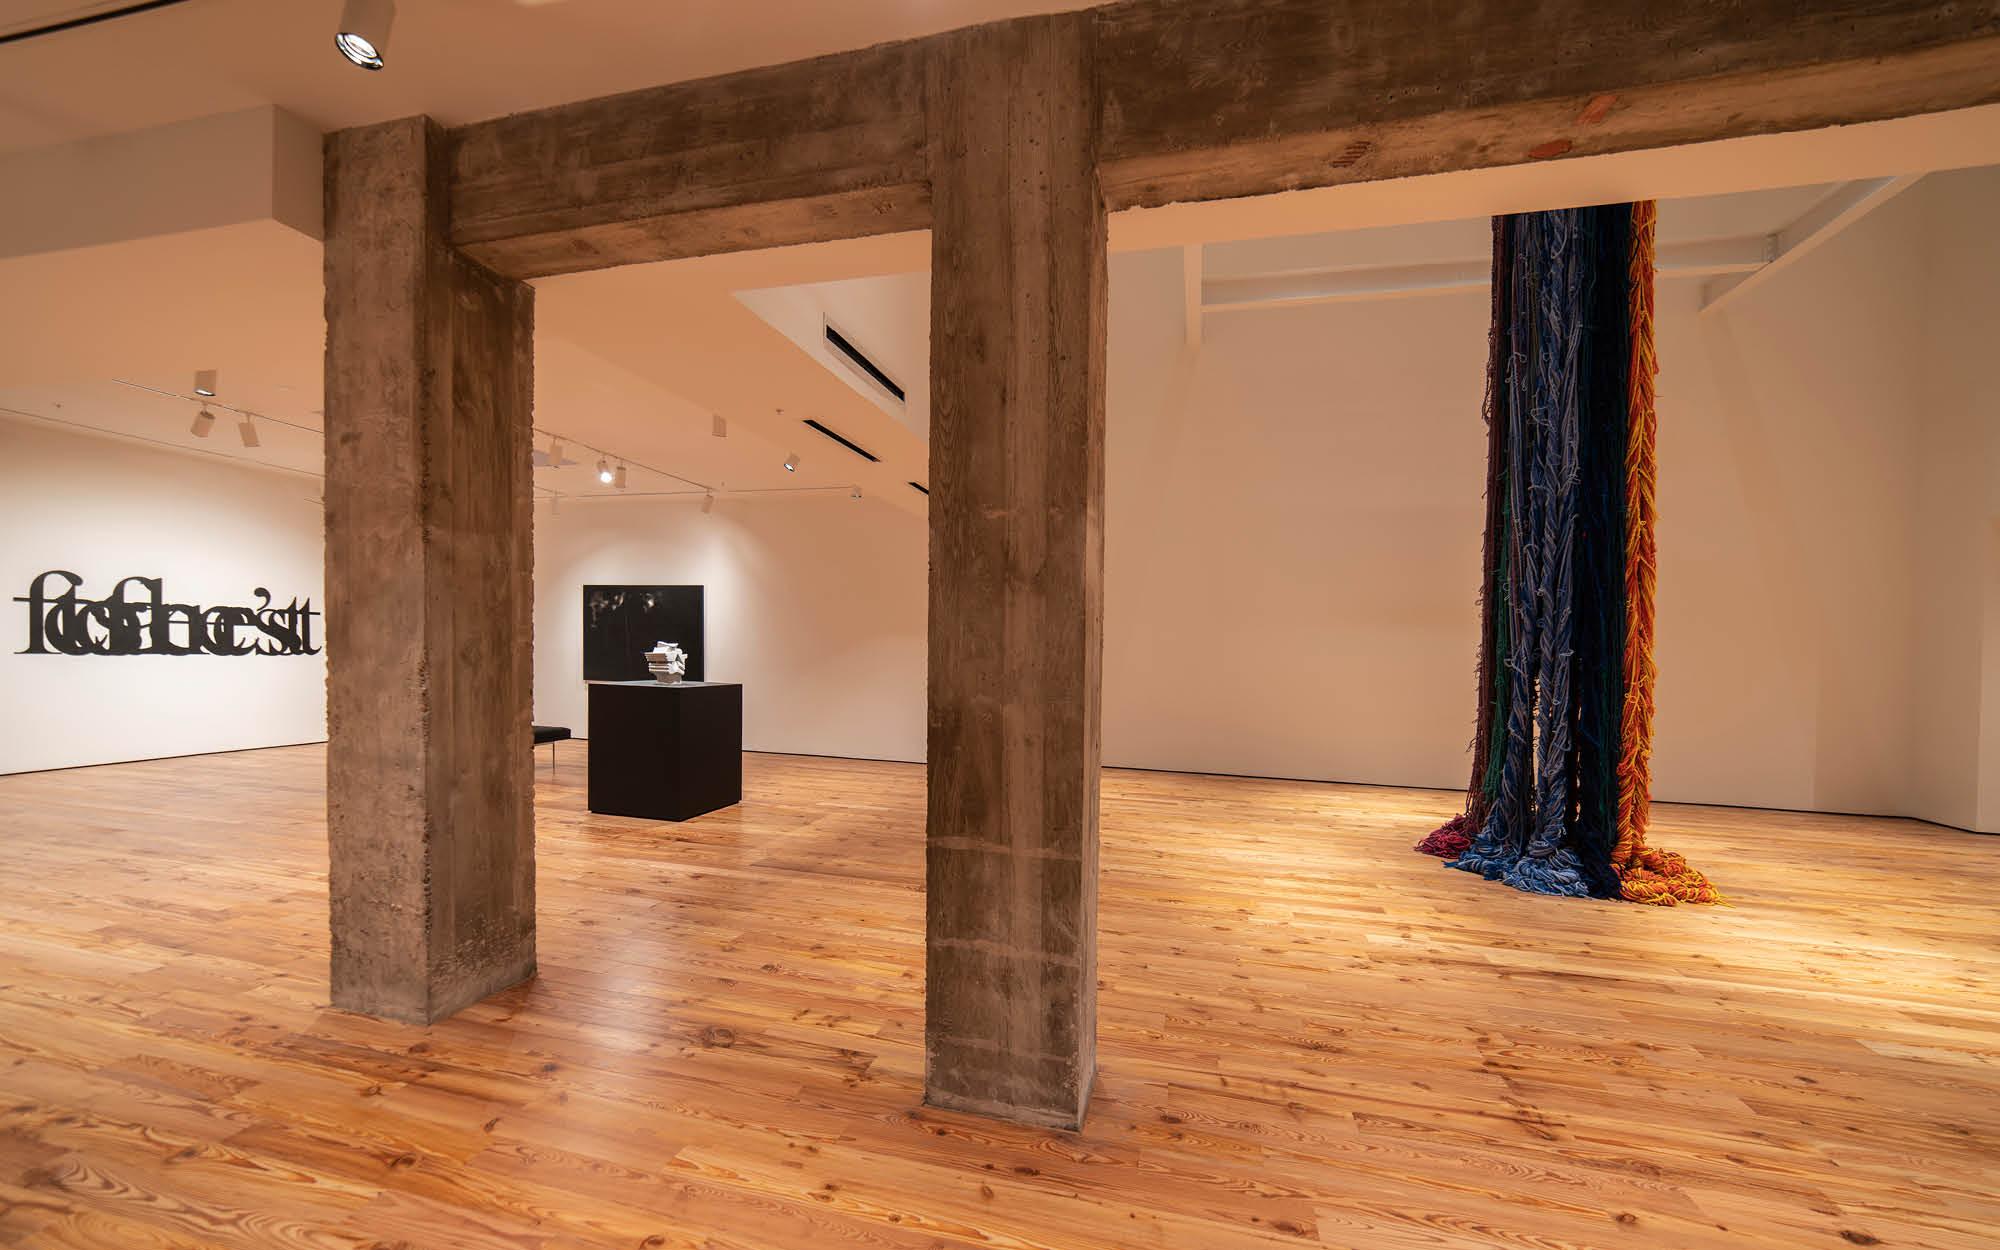 Tom & Sherry Koski Gallery and South Gallery at Sarasota Art Museum